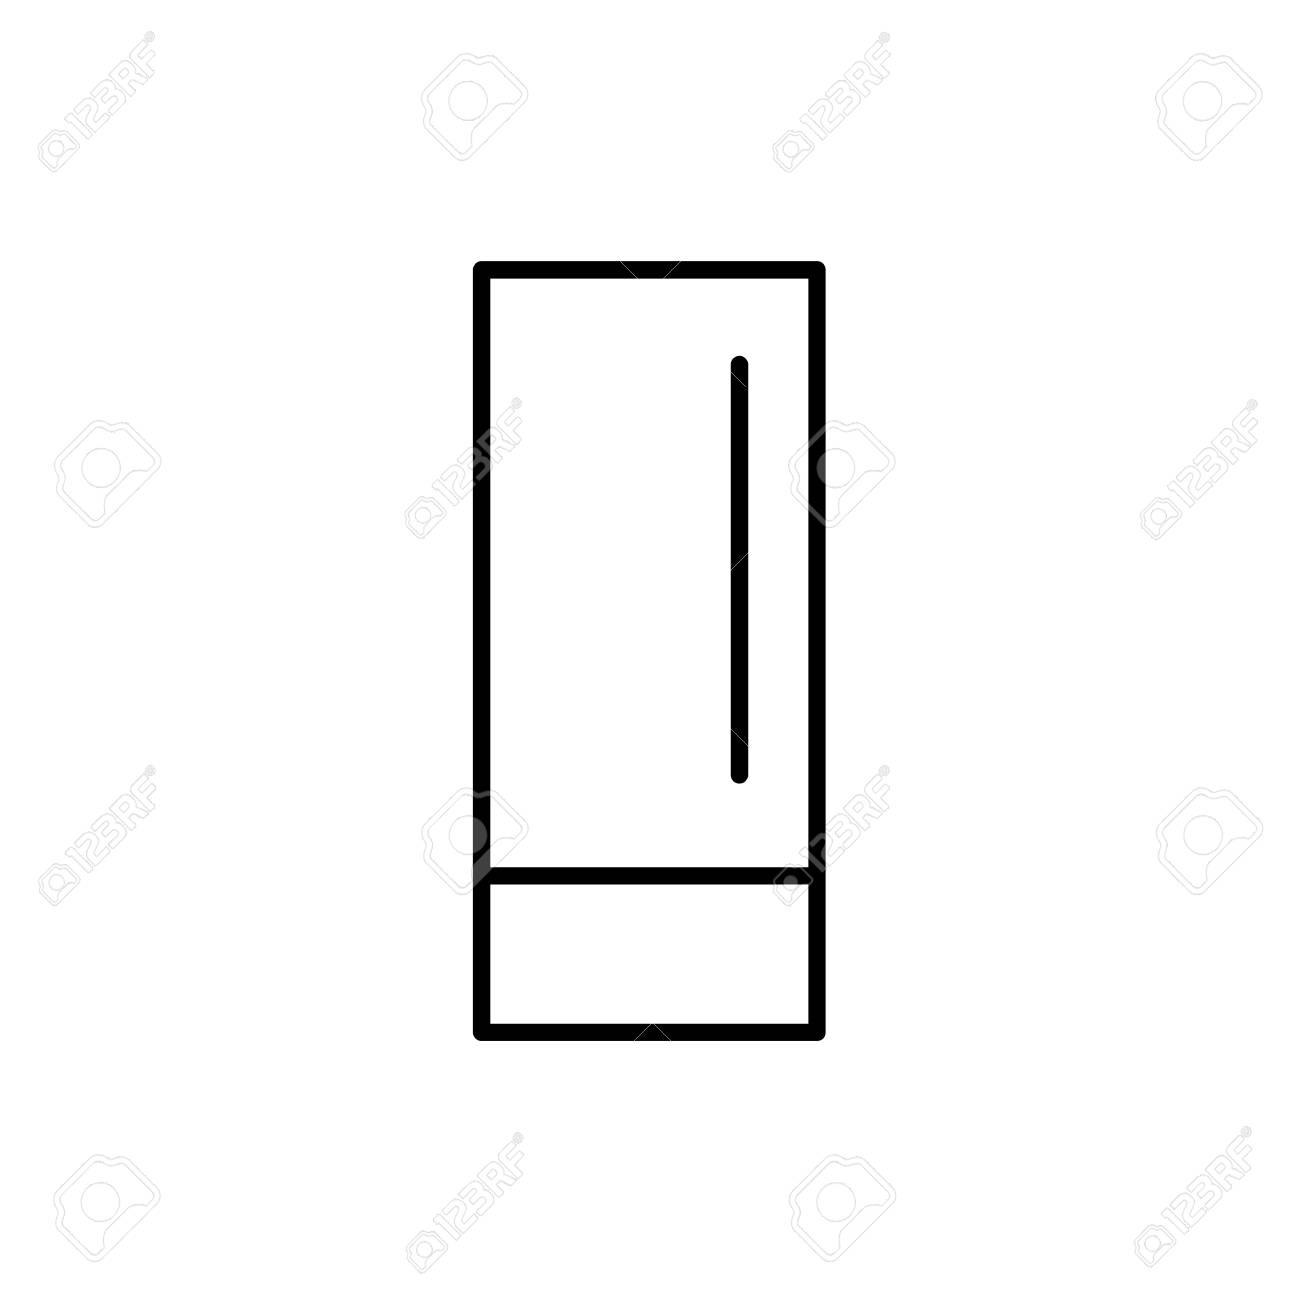 Black White Vector Illustration Of Modern Touch Table Lamp